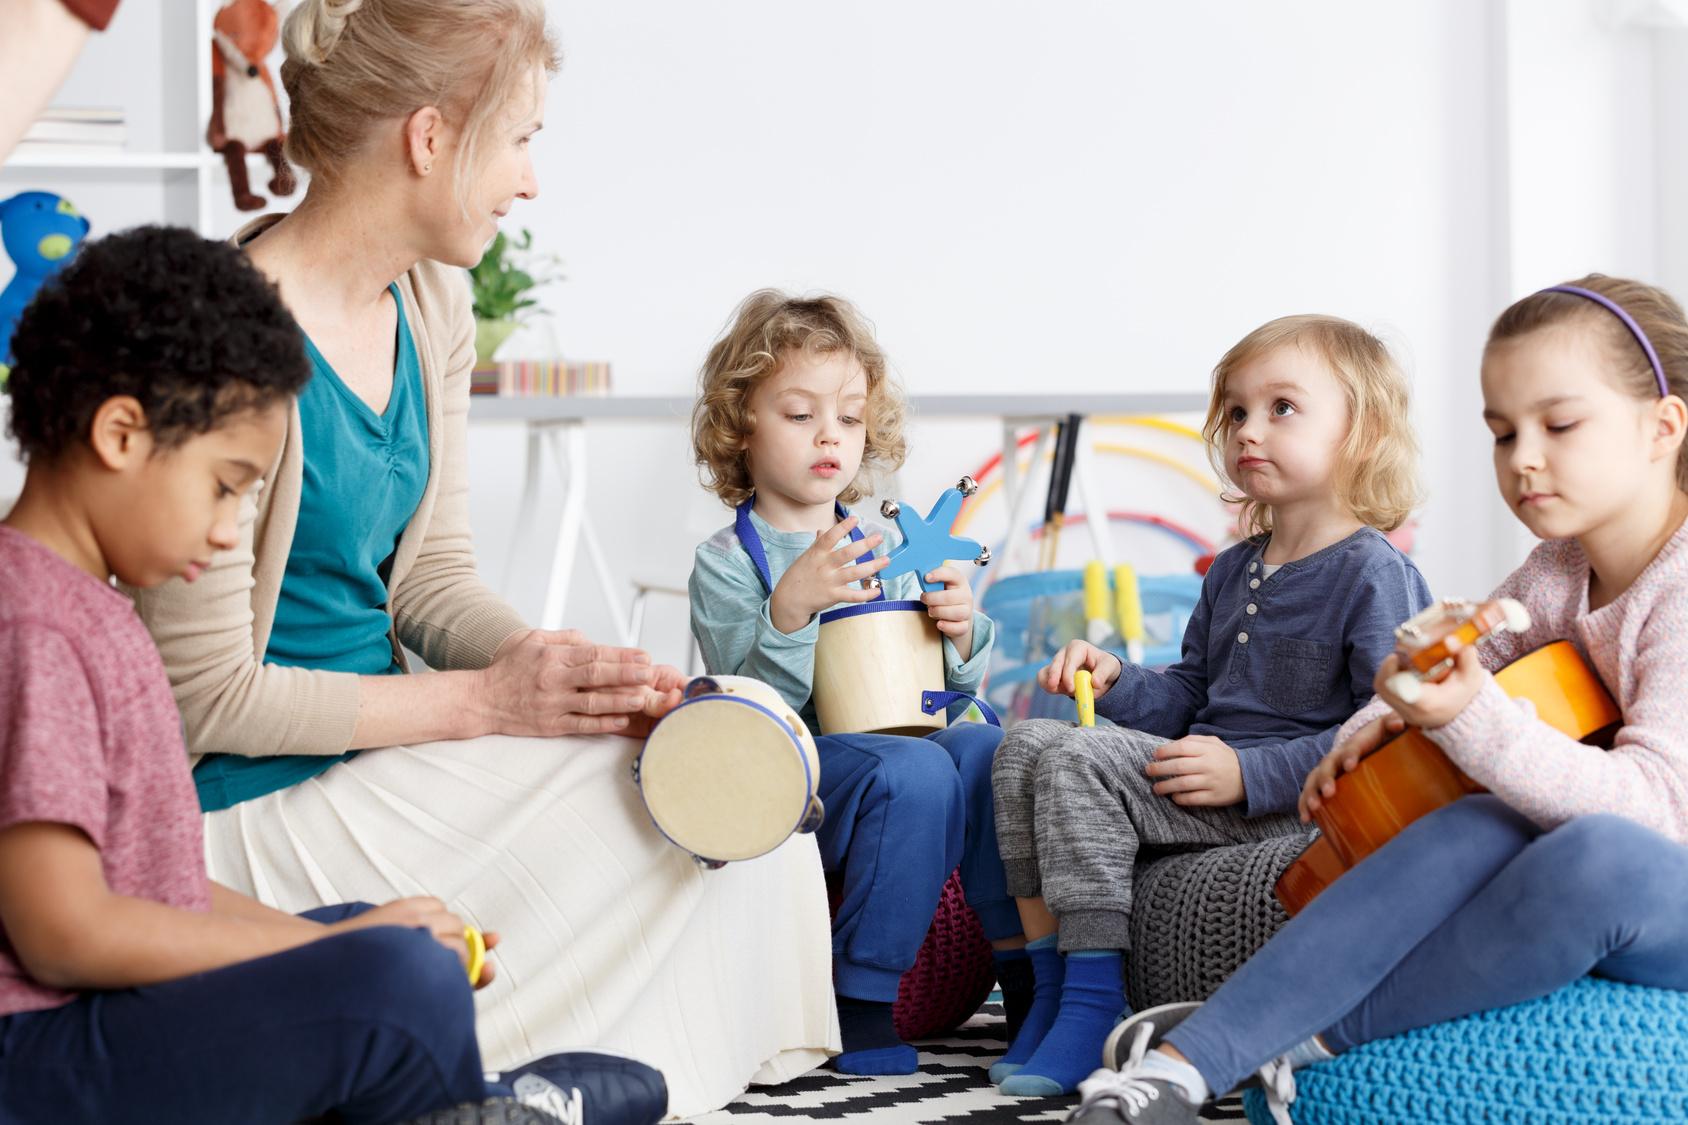 FOBI 41/2018 Kalimba, Xylophon, Trommel & Co – instrumentales Musizieren mit Kindern